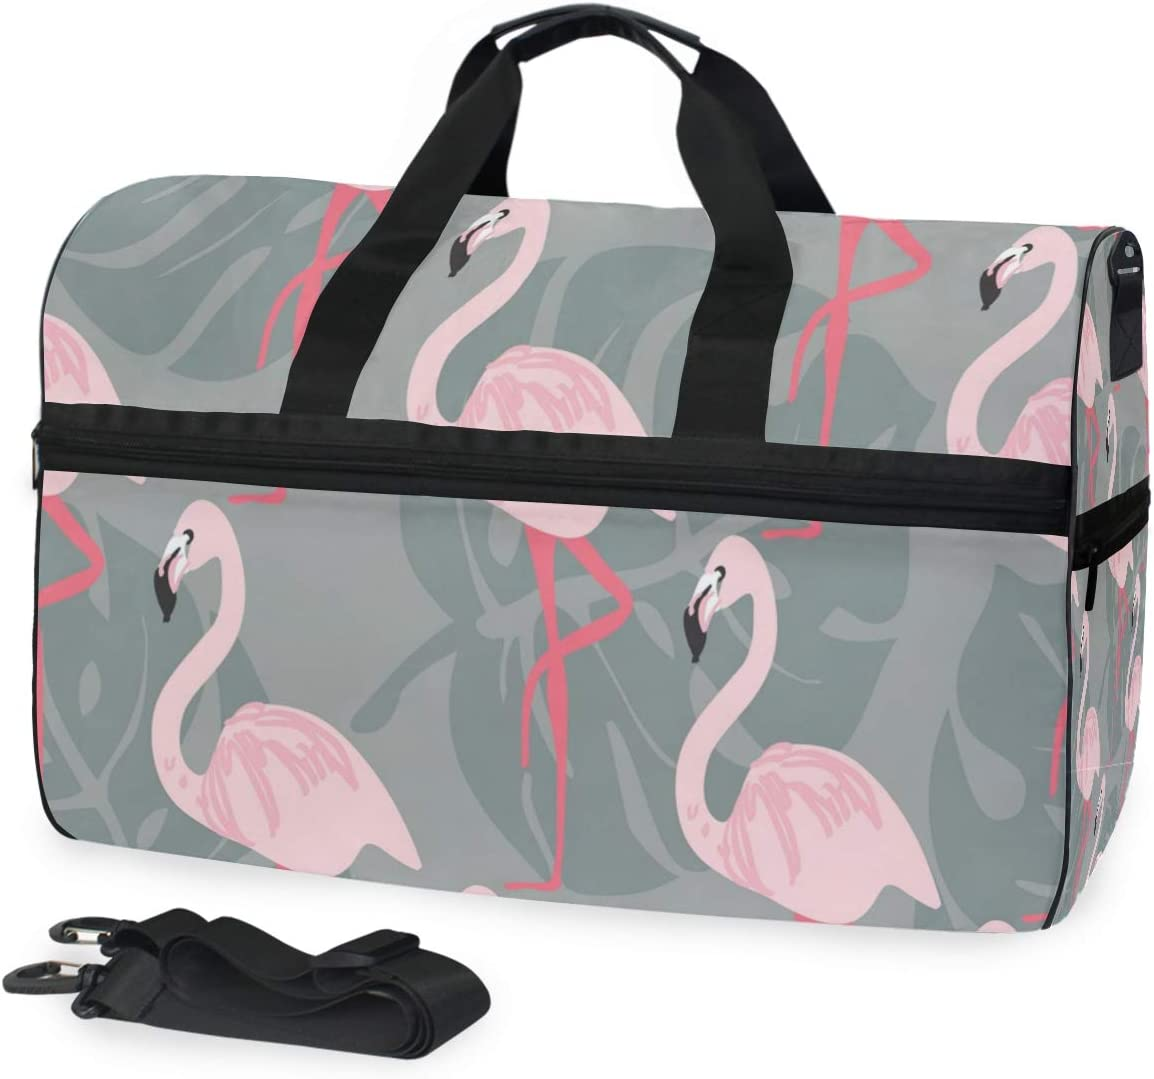 Travel Duffel Bag Waterproof Fashion Lightweight Large Capacity Portable Luggage Bag Pink Flamingo